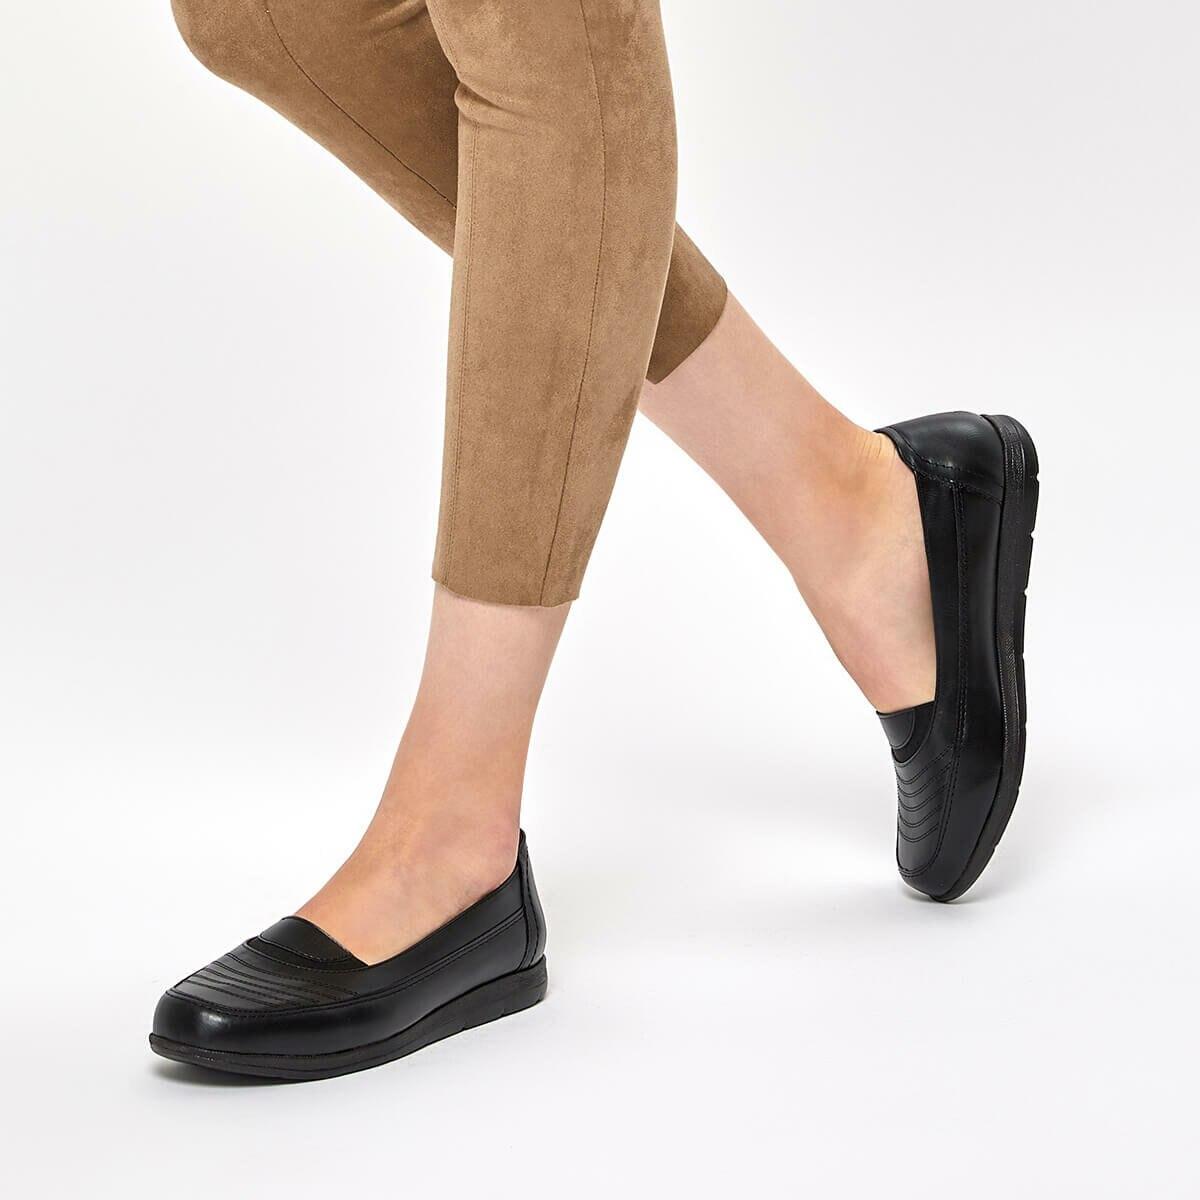 FLO 92.100174.Z Black Women Basic Comfort Polaris 5 Point